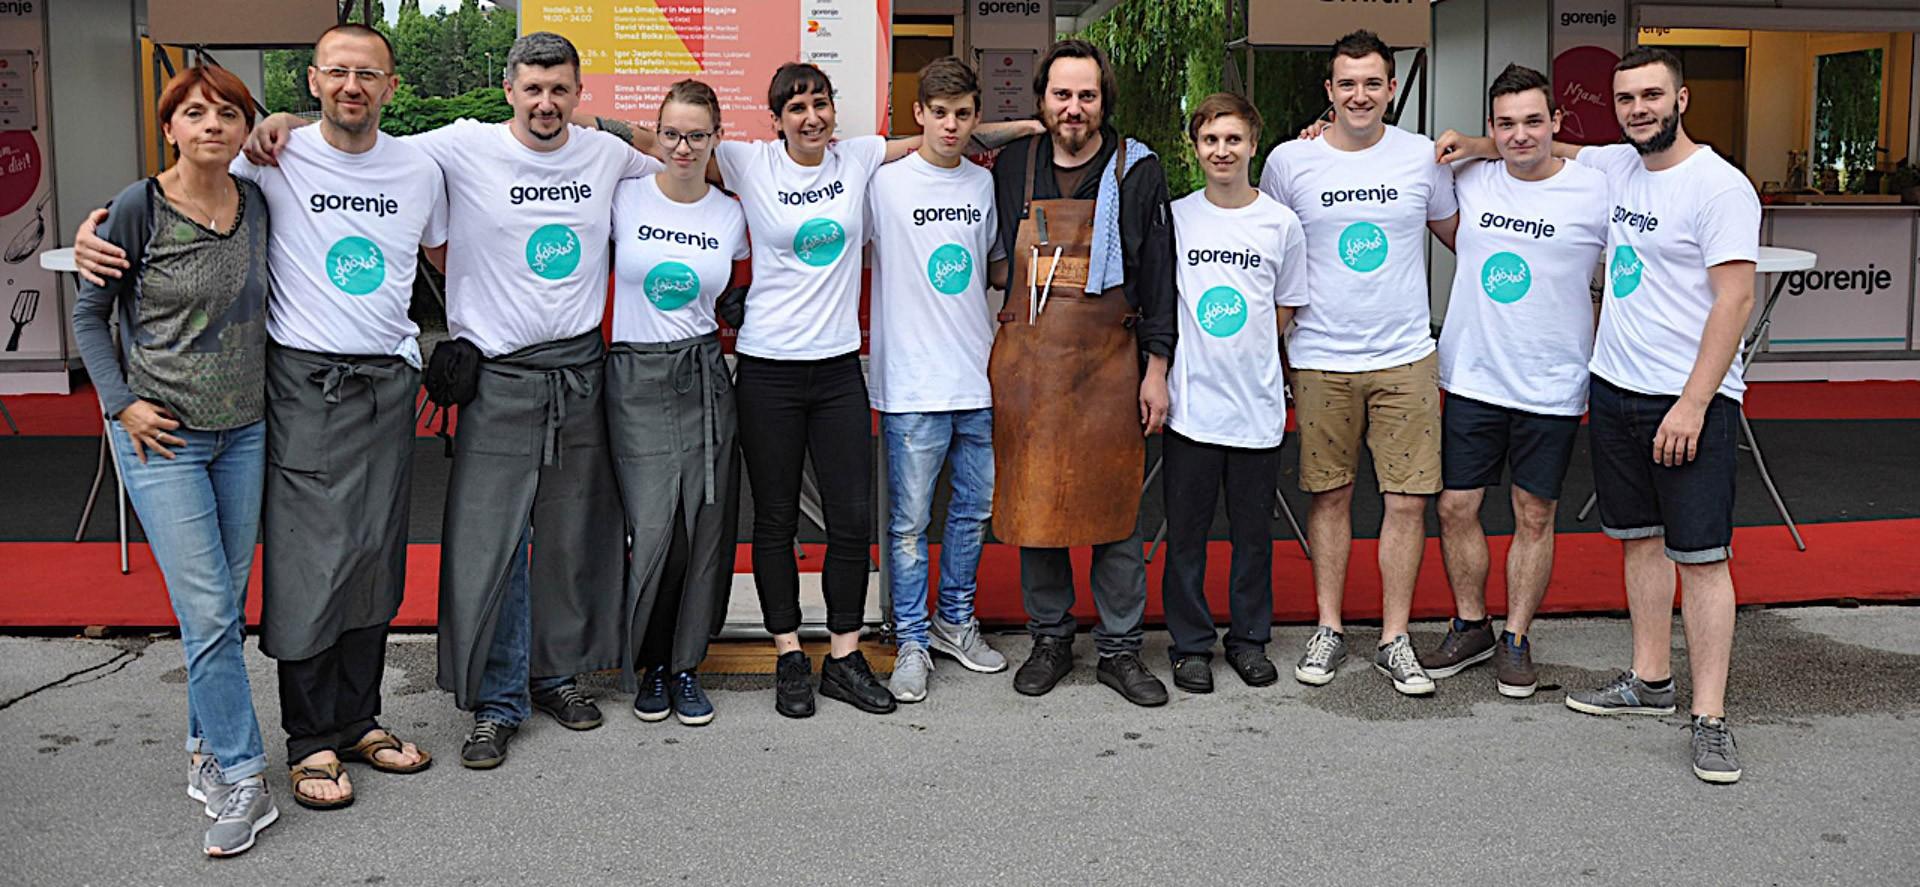 Sladolent 2017 - Krištof in Mak ekipe